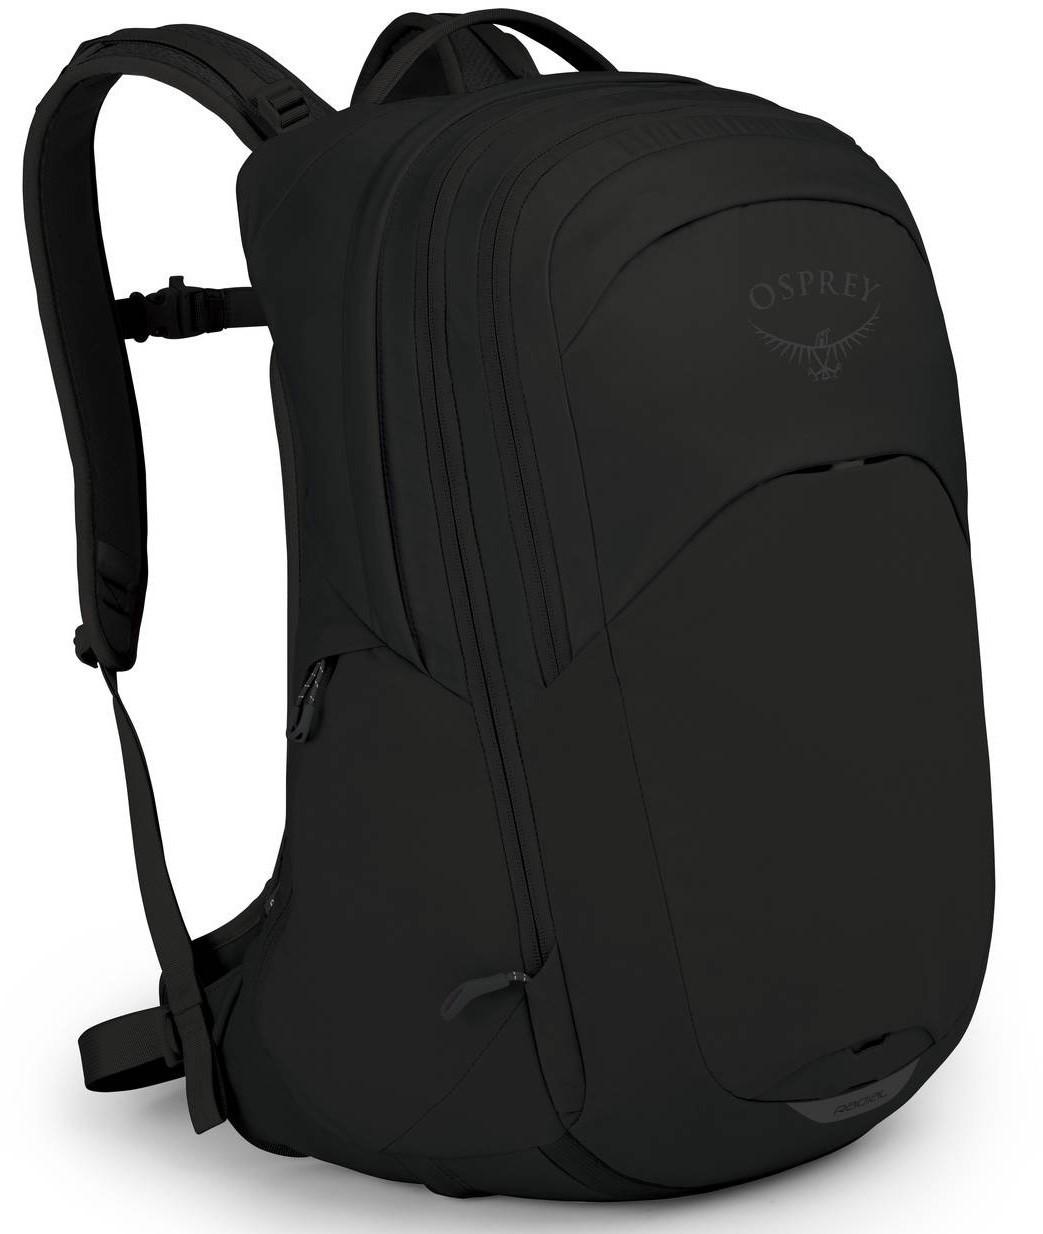 Велорюкзаки Рюкзак Osprey Radial (26-34 литра) Black Radial_F19_Side_Black_web.jpg